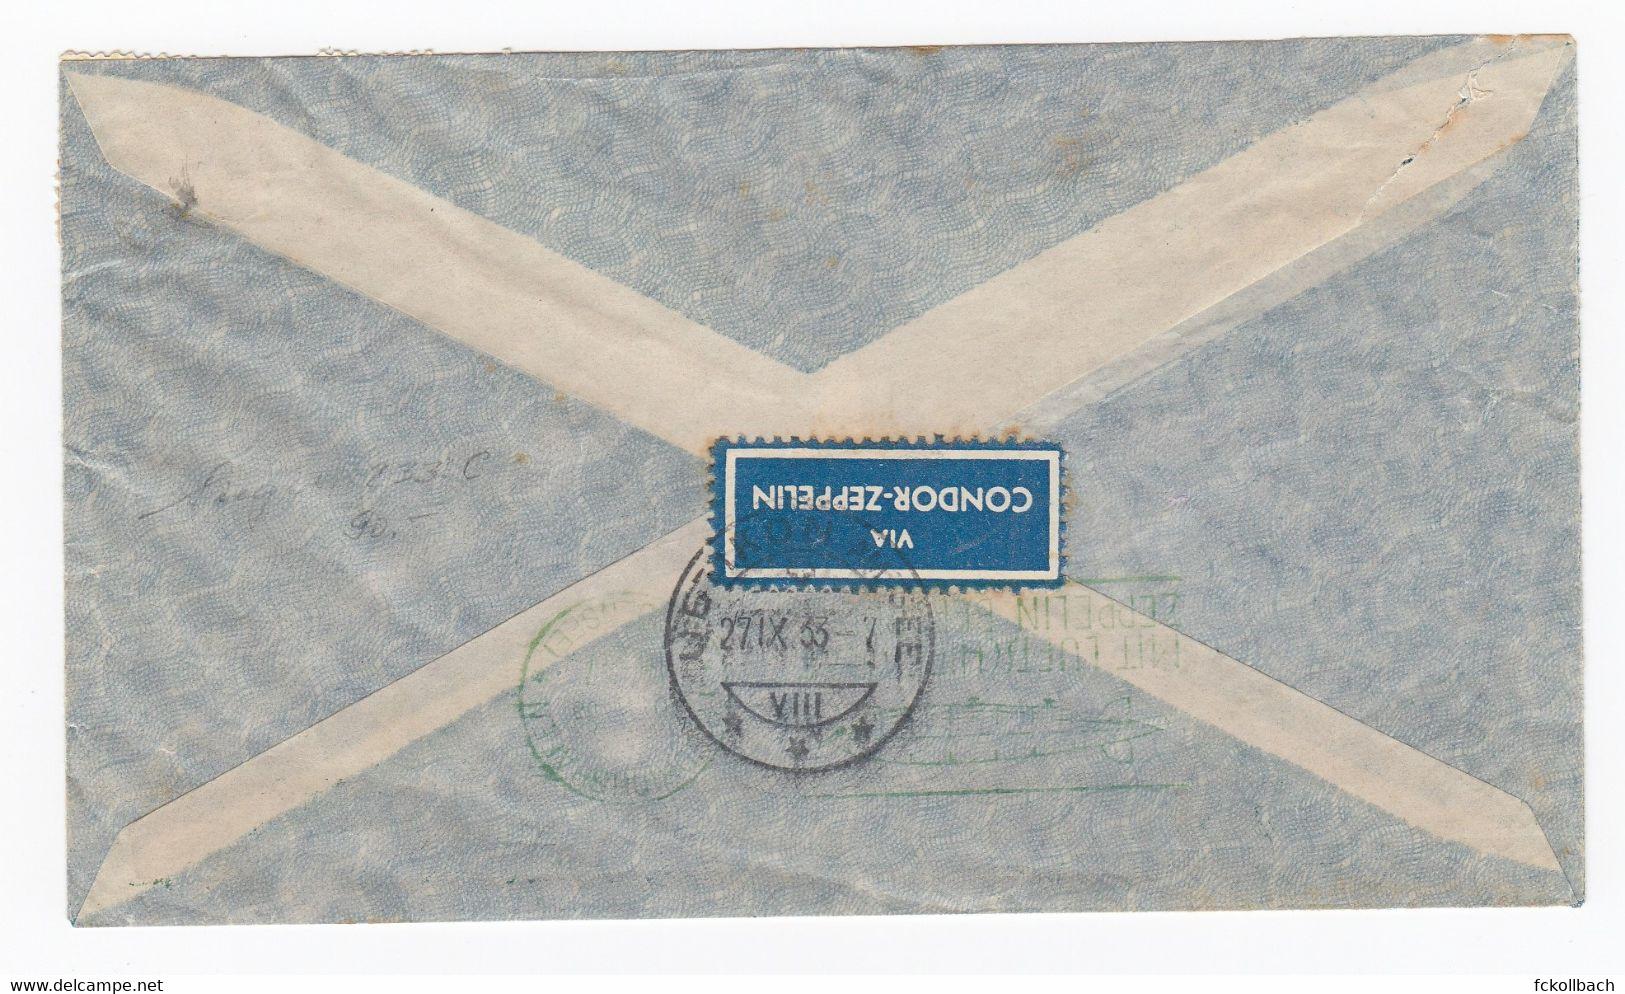 Brasil Air Mail Letter Bahia To Uetikon Switzerland Suisse By Zeppelin Servico Aero Tansatlantico Condor Zeppelin 1933 - Luftpost